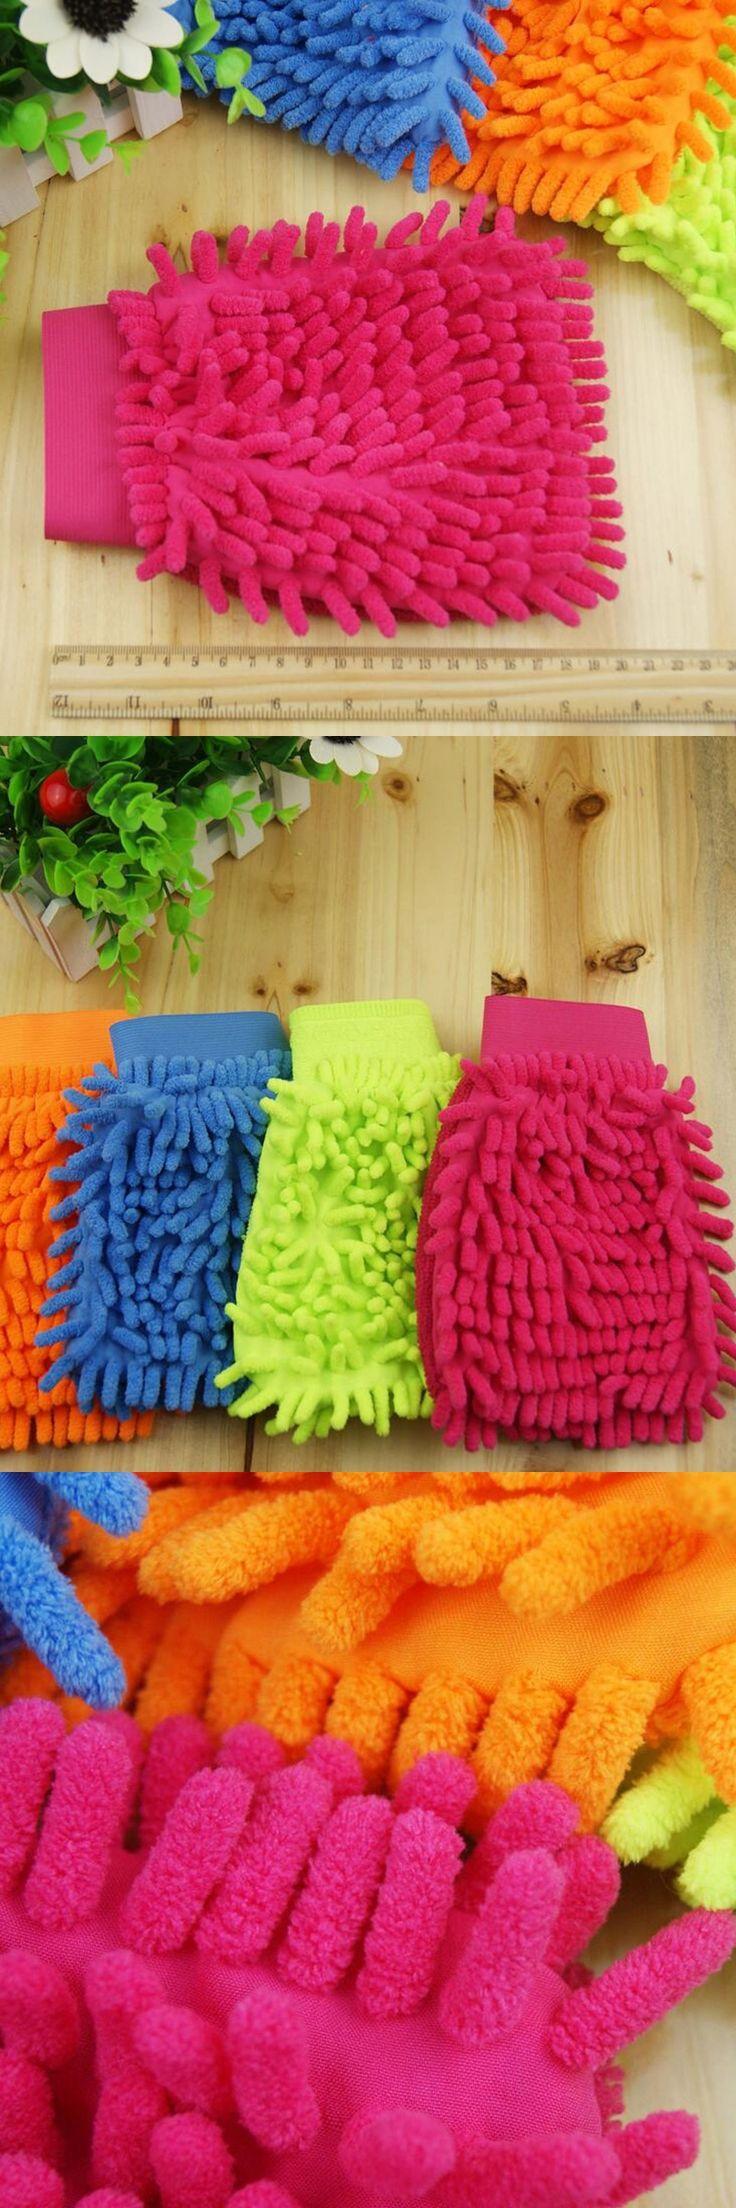 1PC Elastic cuffs Chenille Coral Velvet Car Wash Dust Removal Glove Car Wash Tools Car Cleaning Supplies Cloth Towel Glove L22